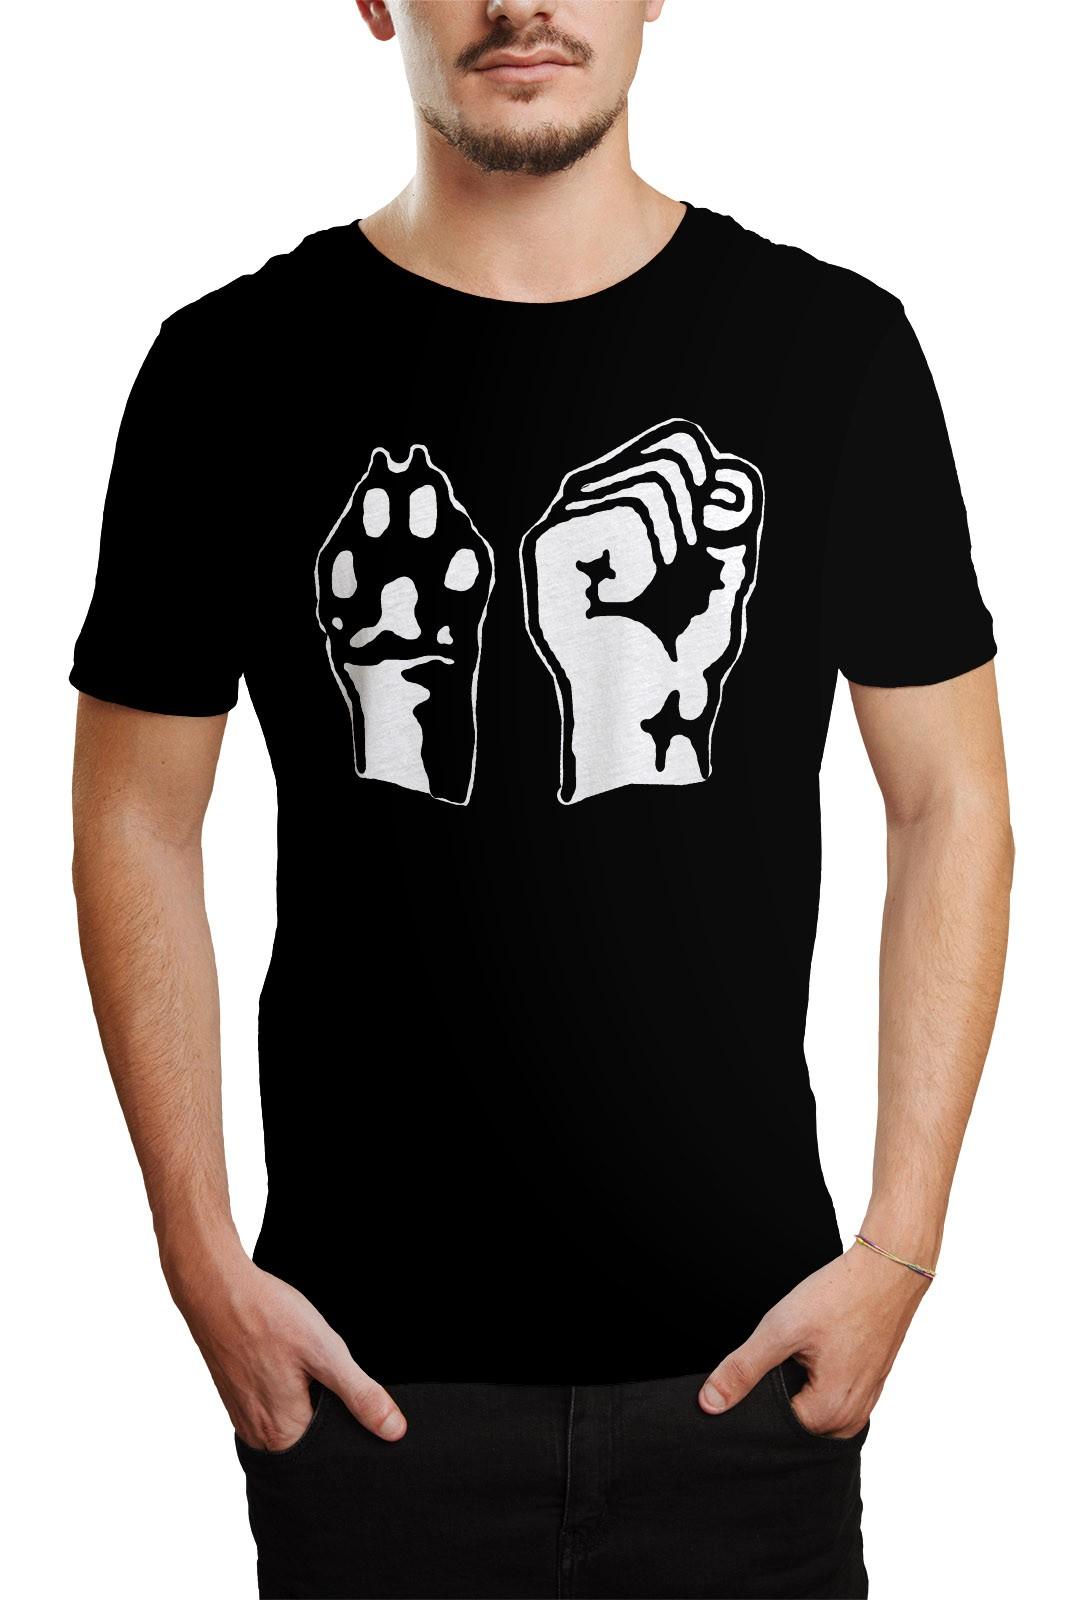 Camiseta Animal Liberation Preto  - HShop